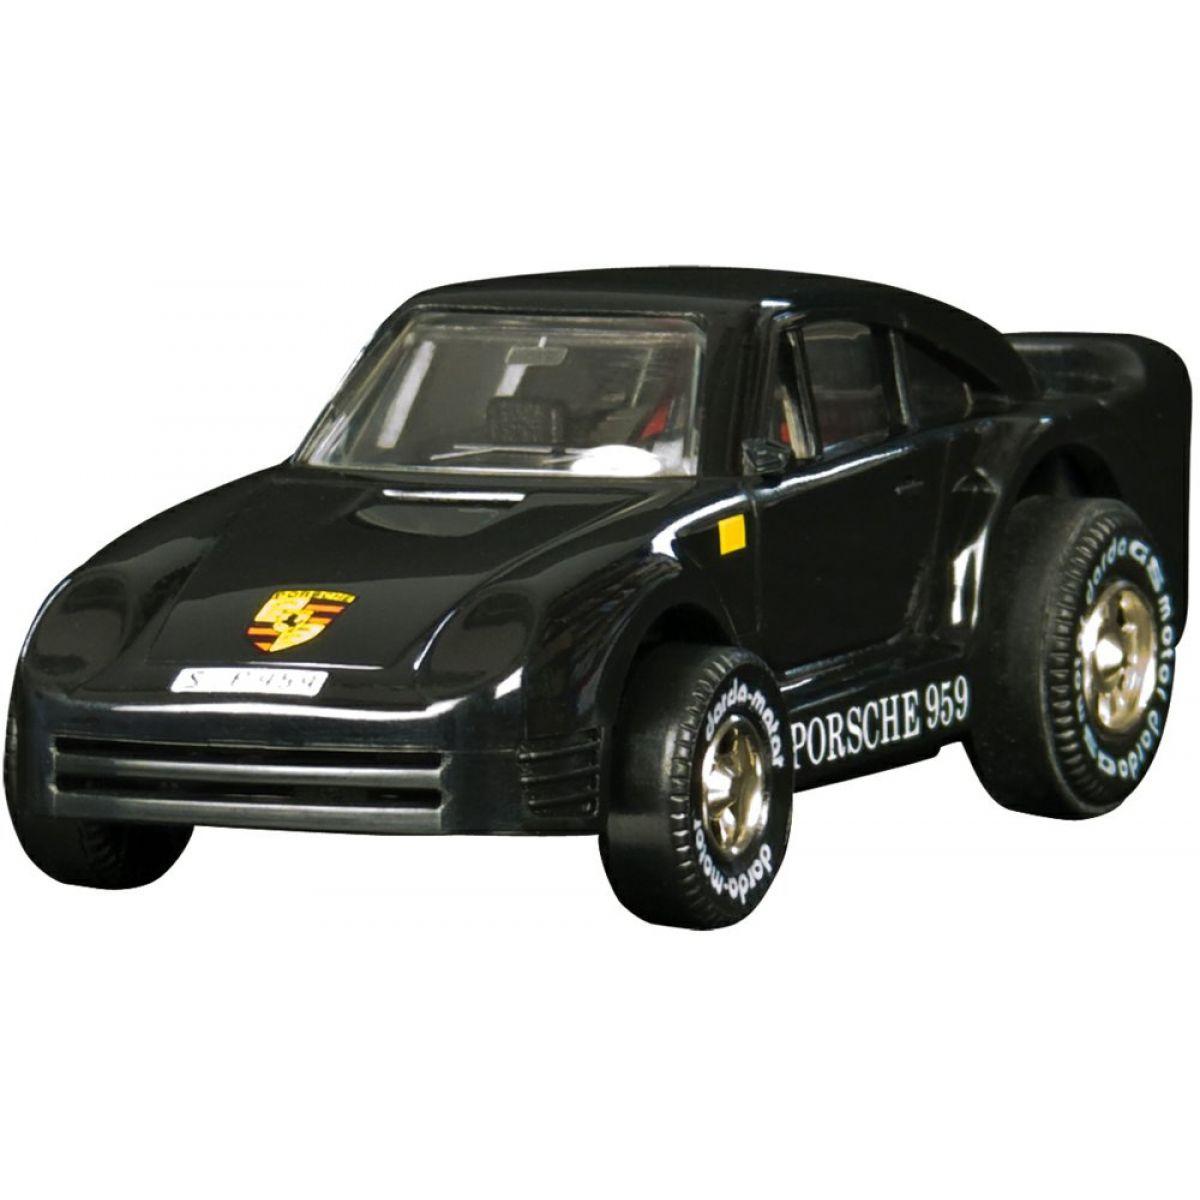 Darda Porsche 958 čierne